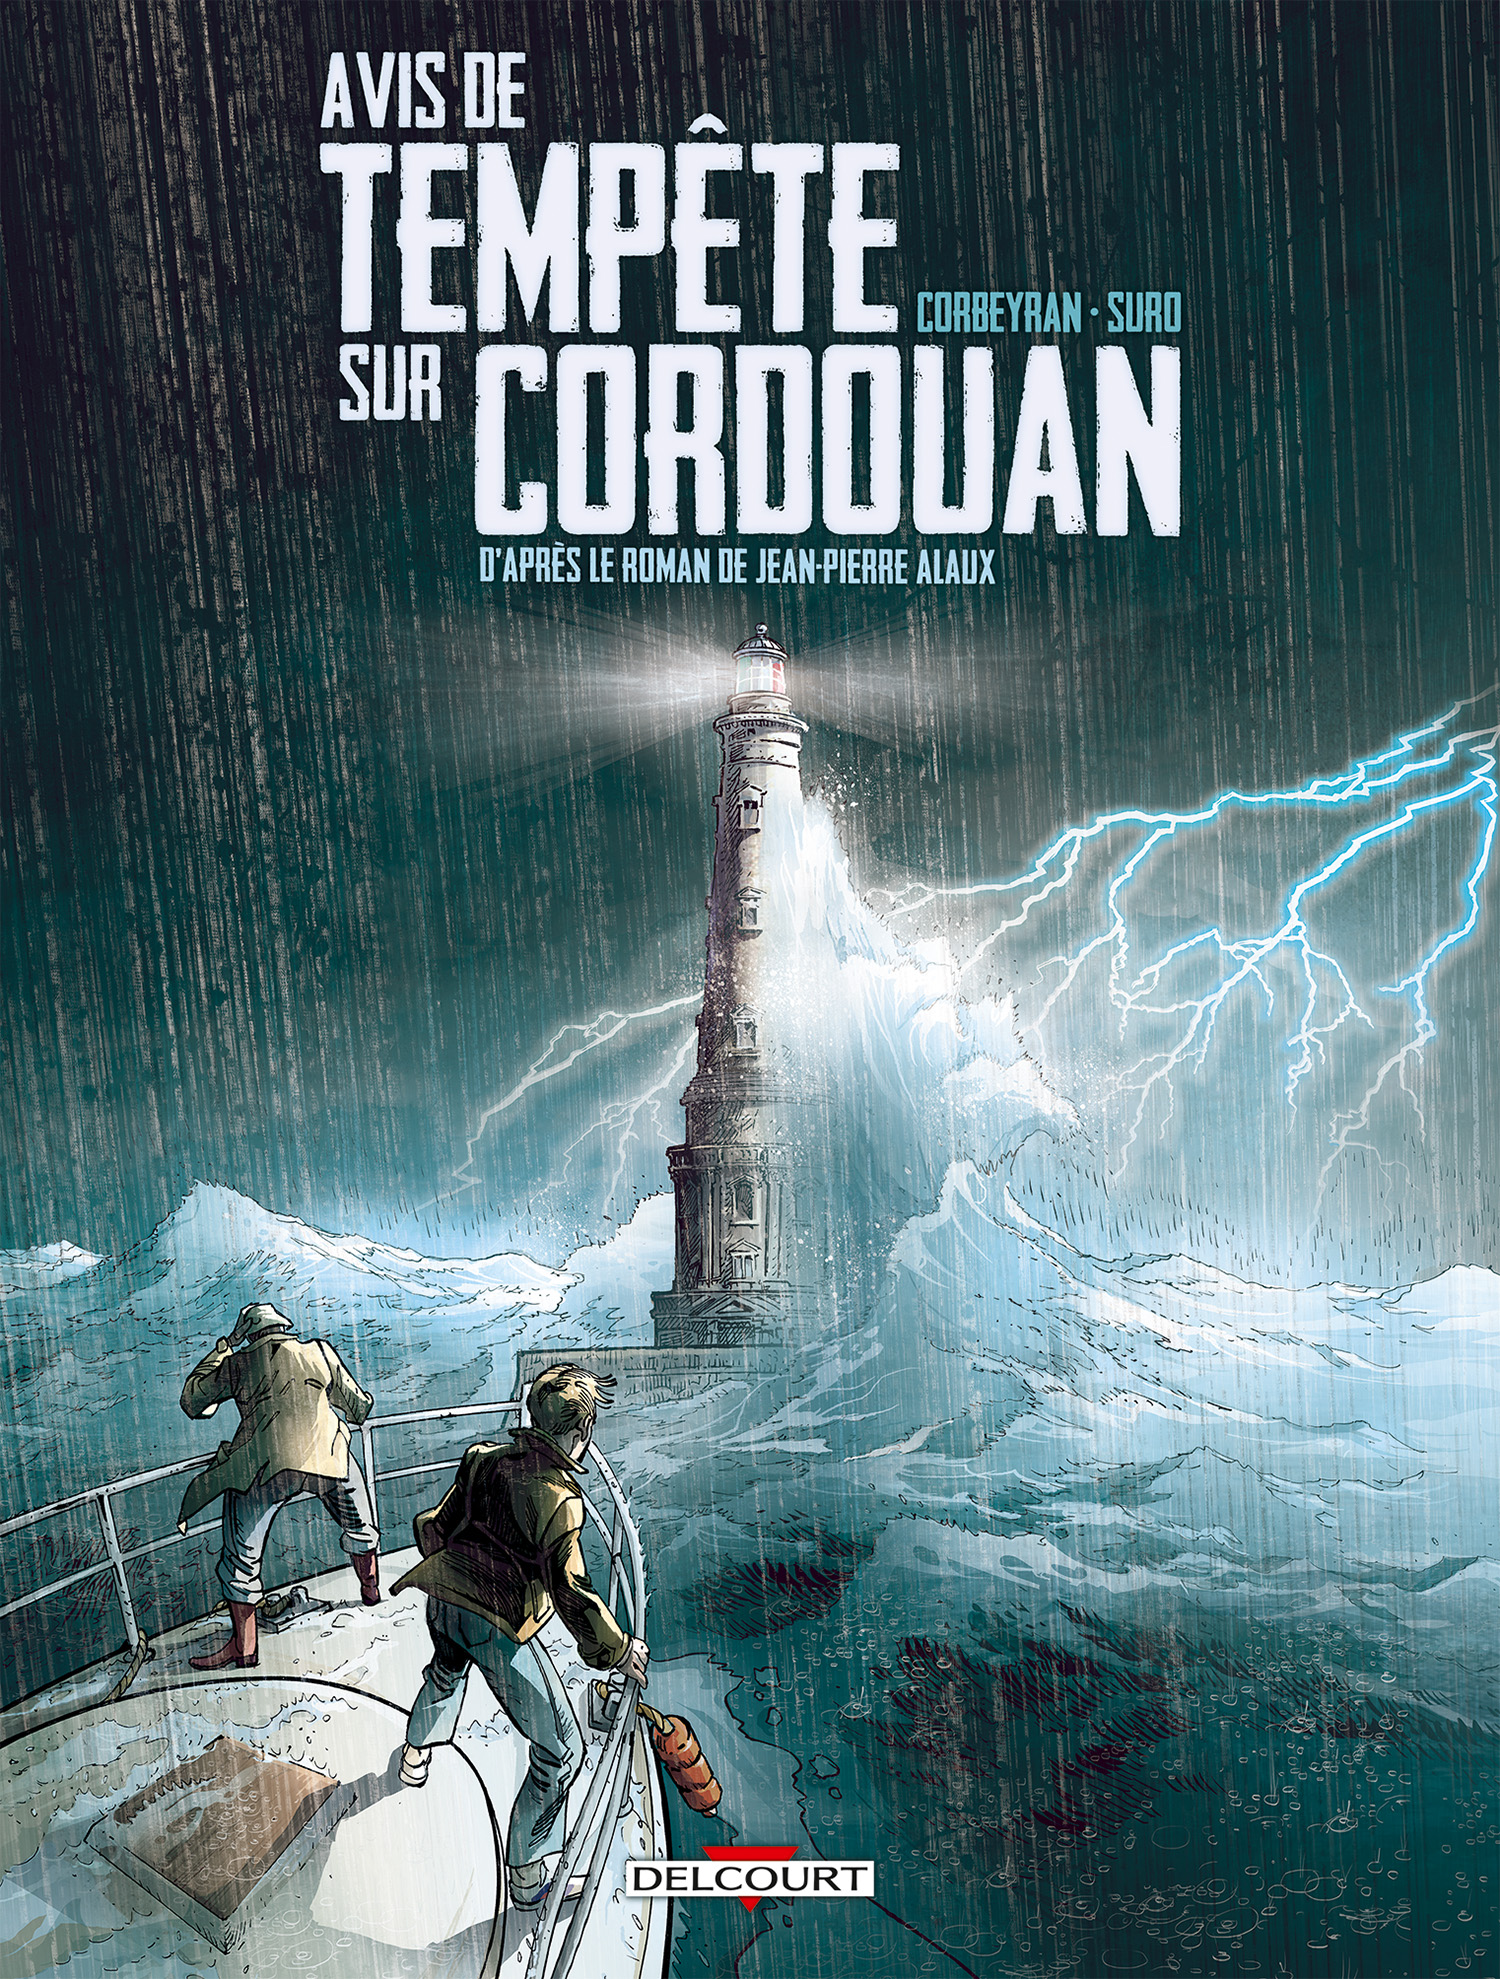 Séraphin Cantarel T1 : Avis de tempête sur Cordouan (0), bd chez Delcourt de Corbeyran, Suro, Saint Blancat